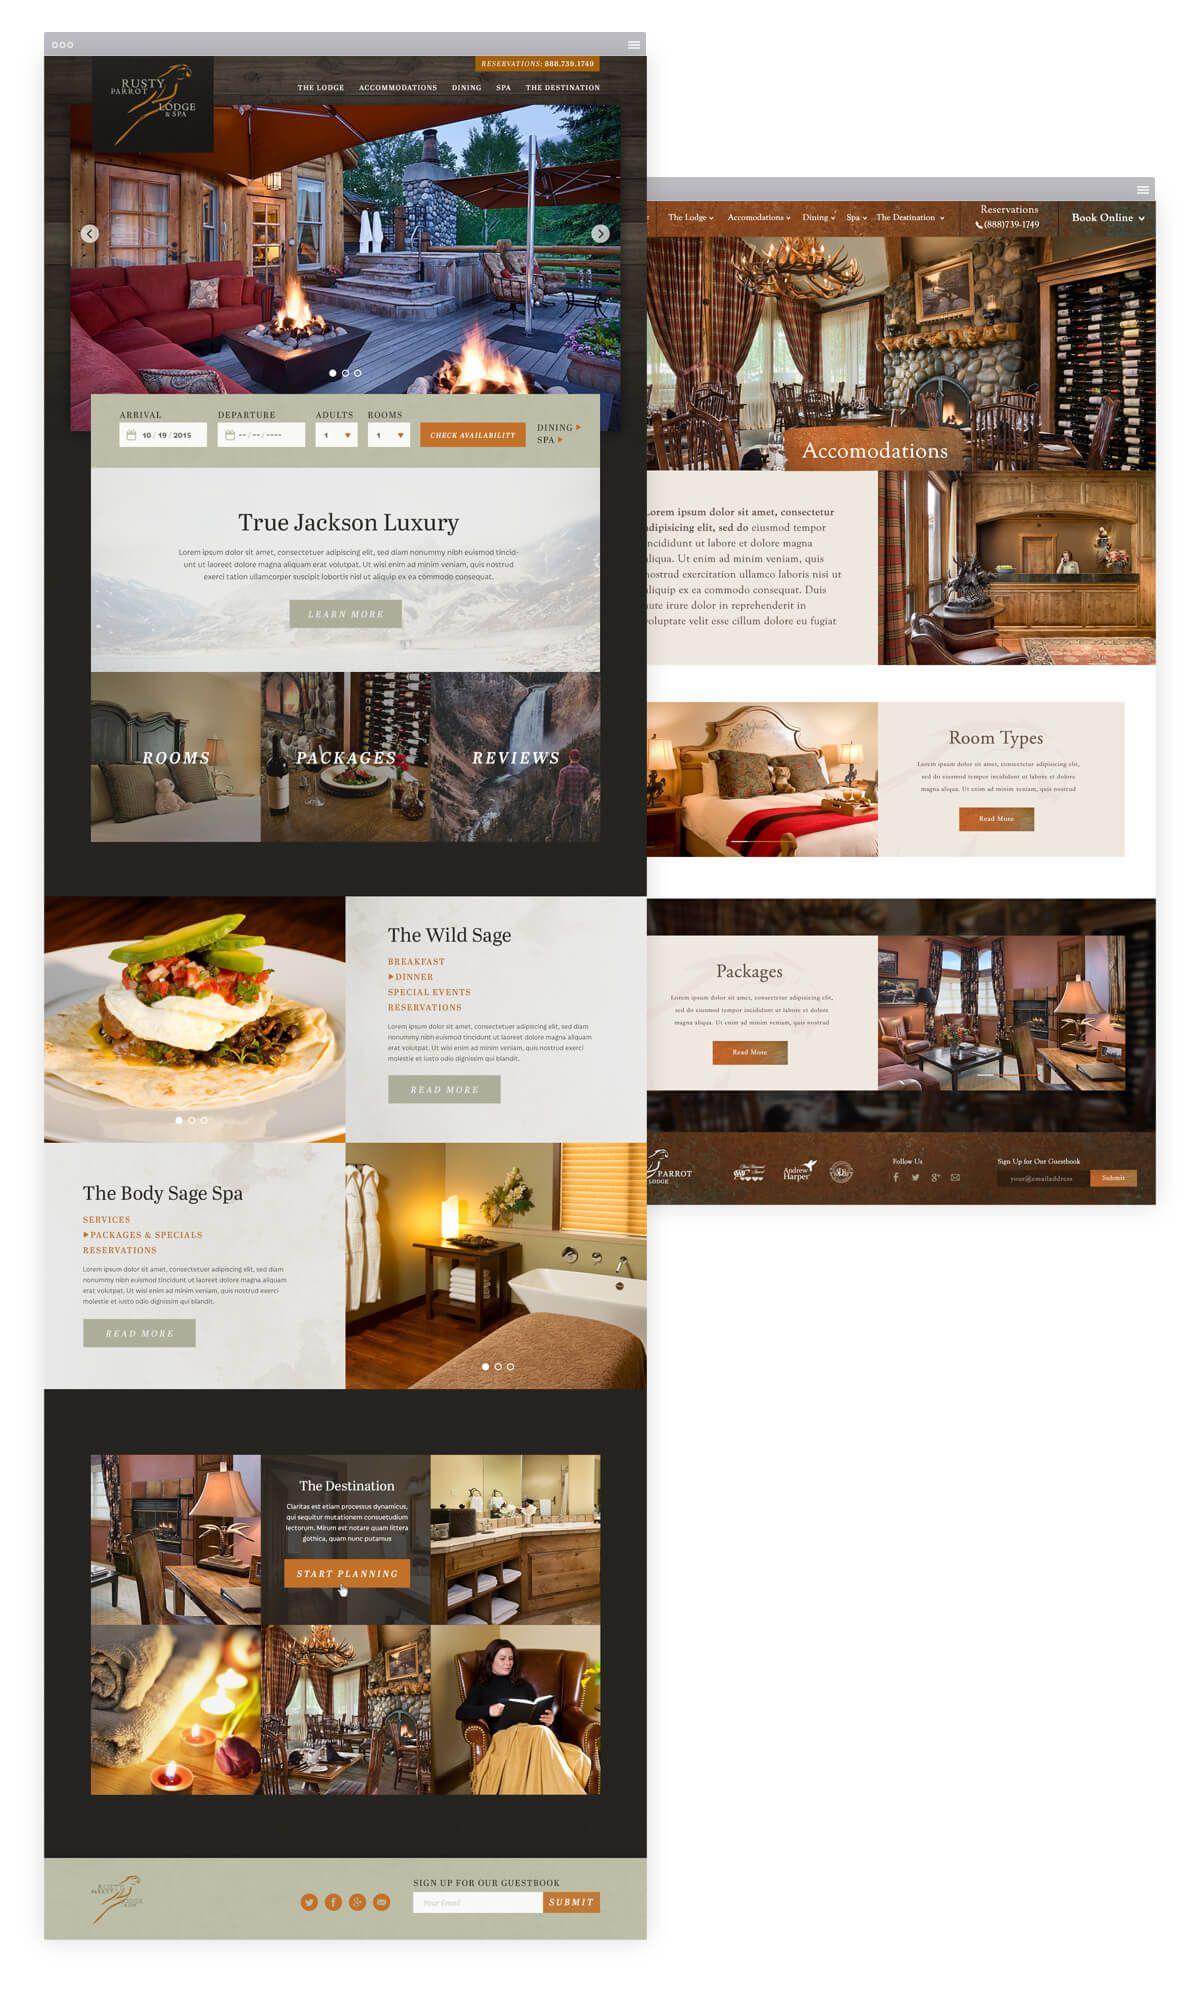 Work Wonderwild Website Design Design How To Memorize Things